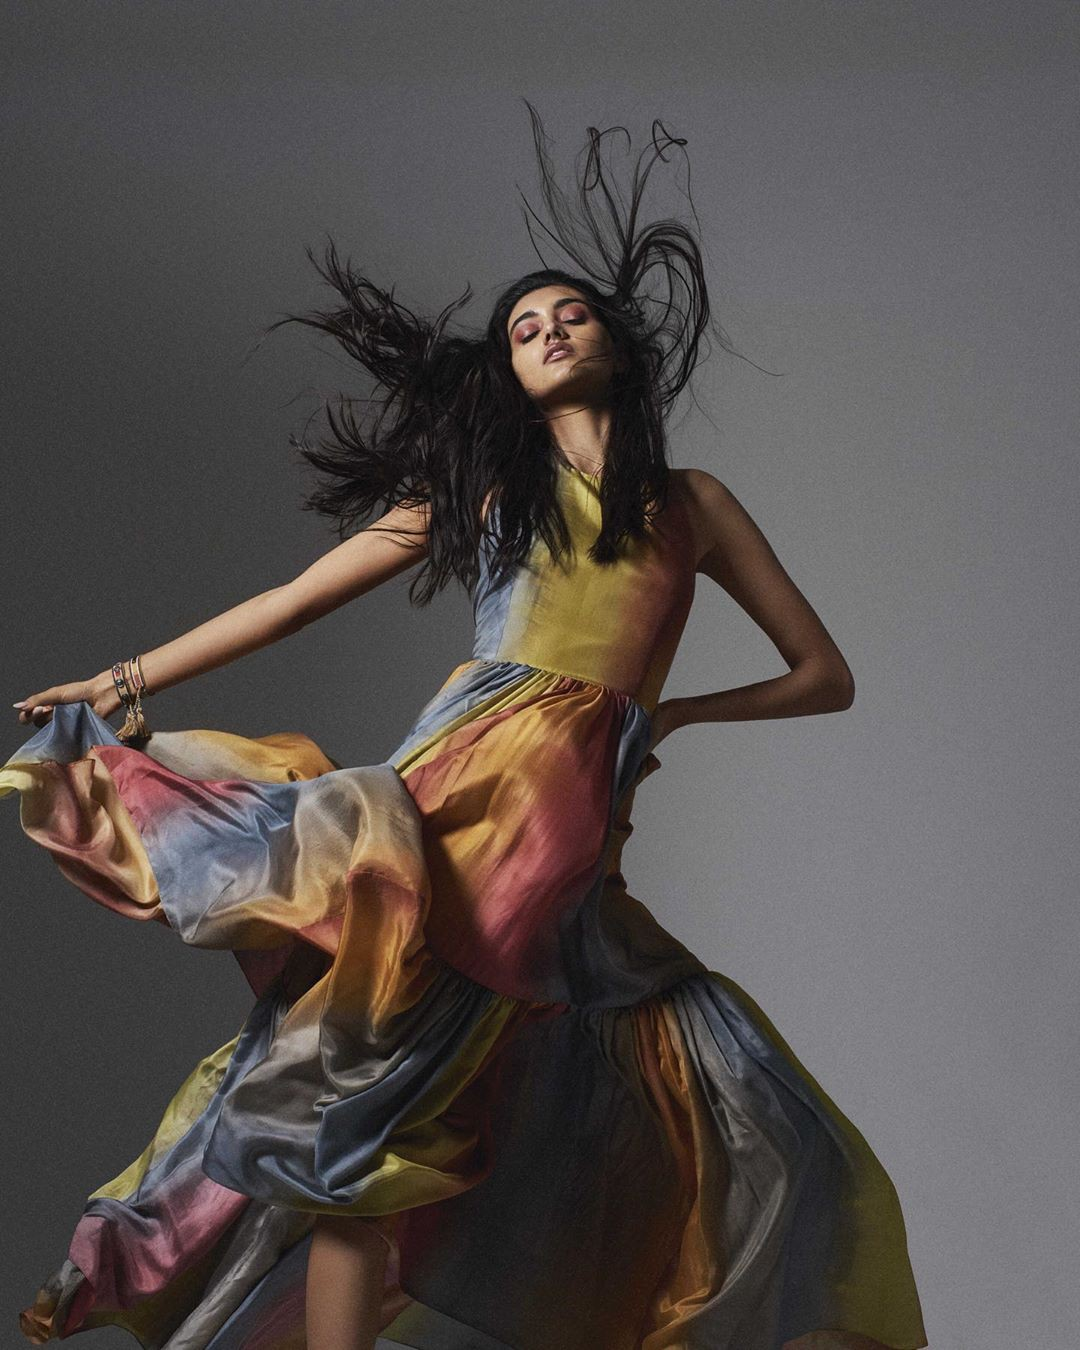 Neelam Gill photoshoot poses, fashion photography, performing arts